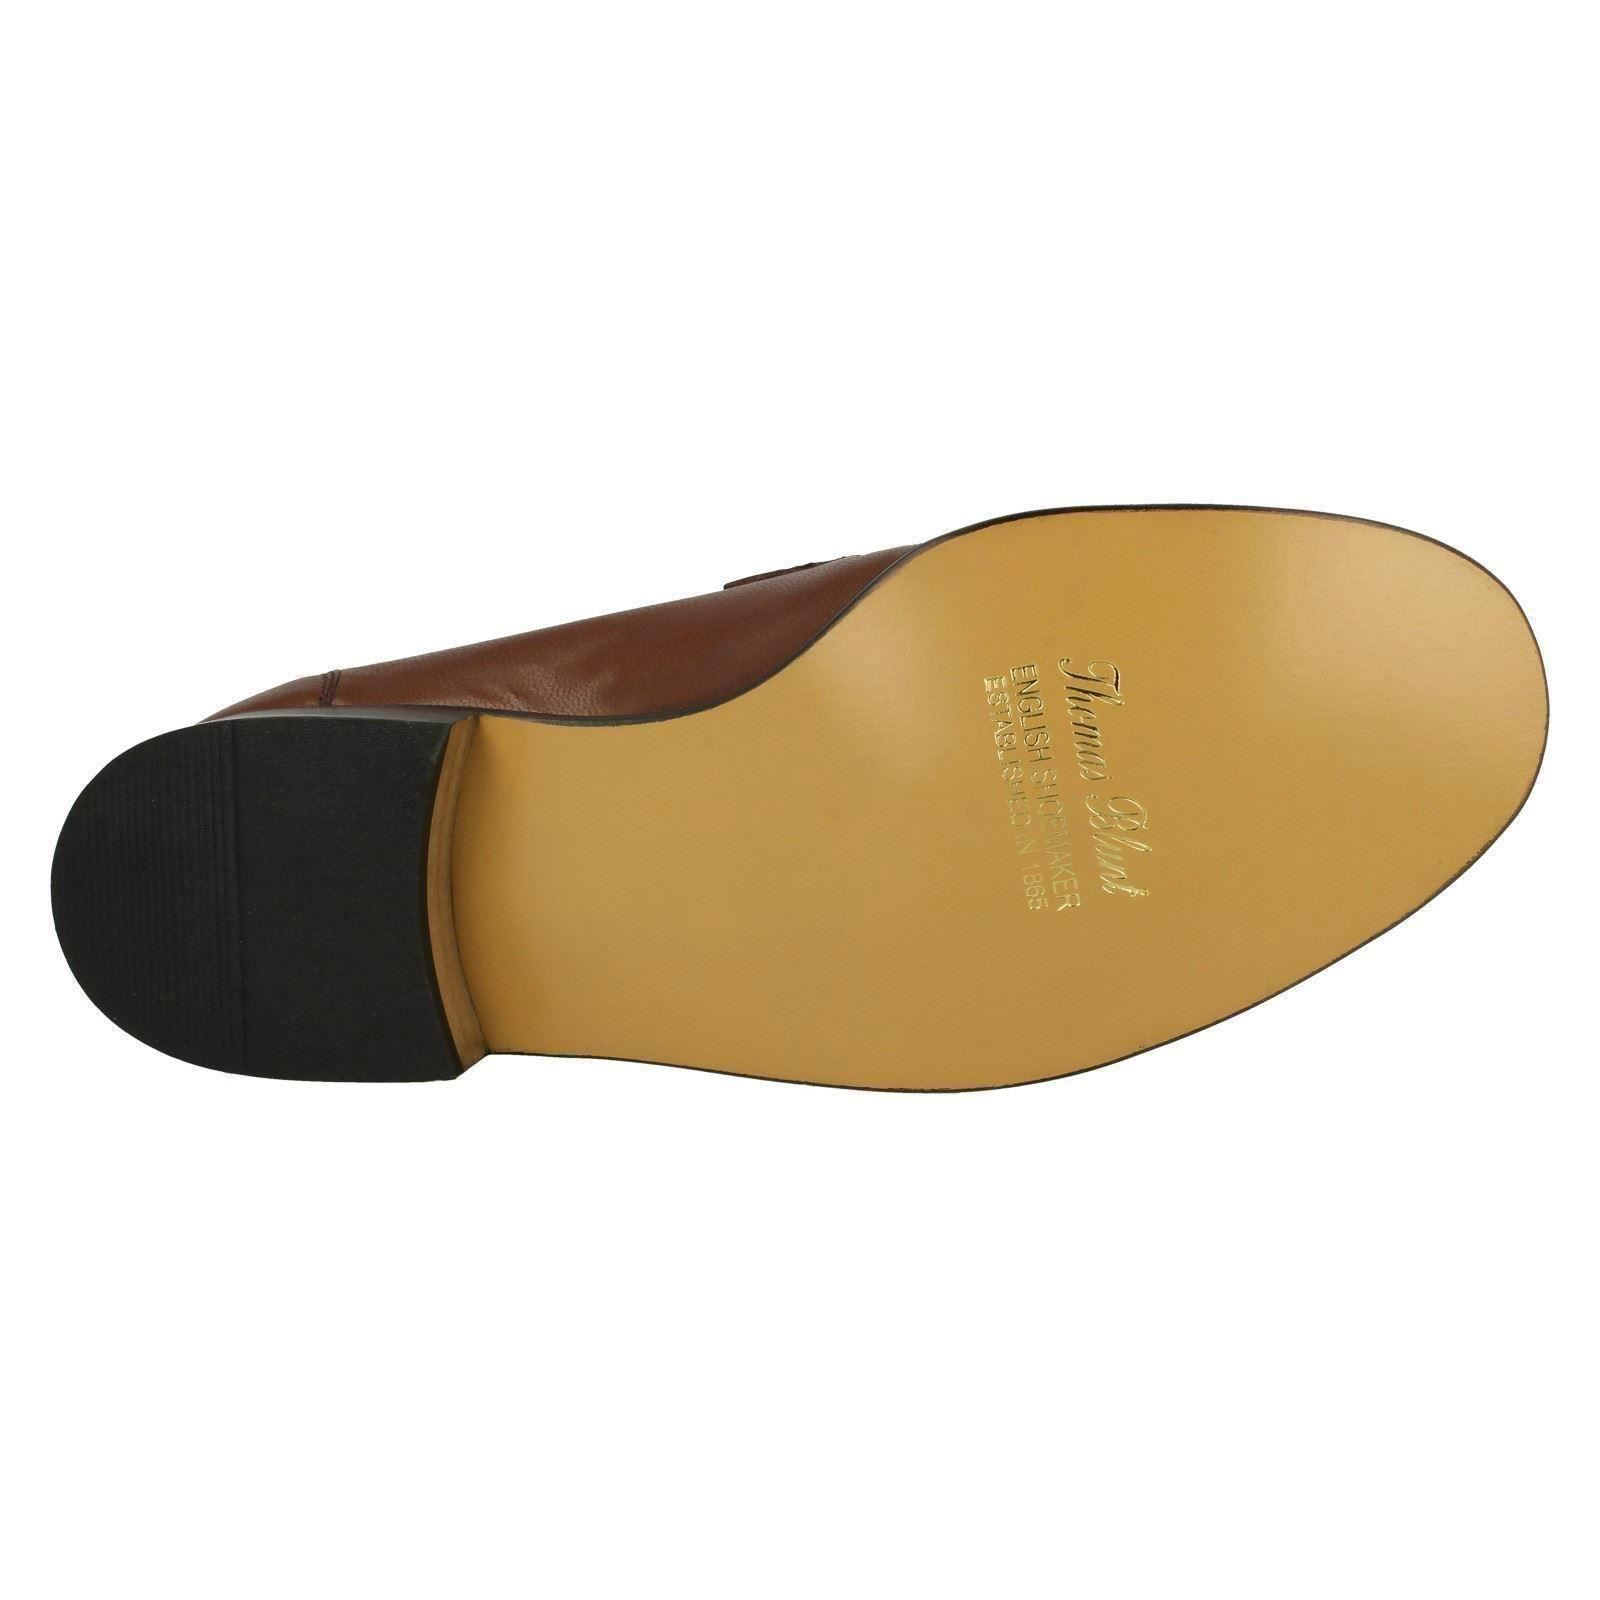 Herren Thomas Blunt 'Clapham' Formal Moccasin Moccasin Moccasin Schuhes Label  K f8924a